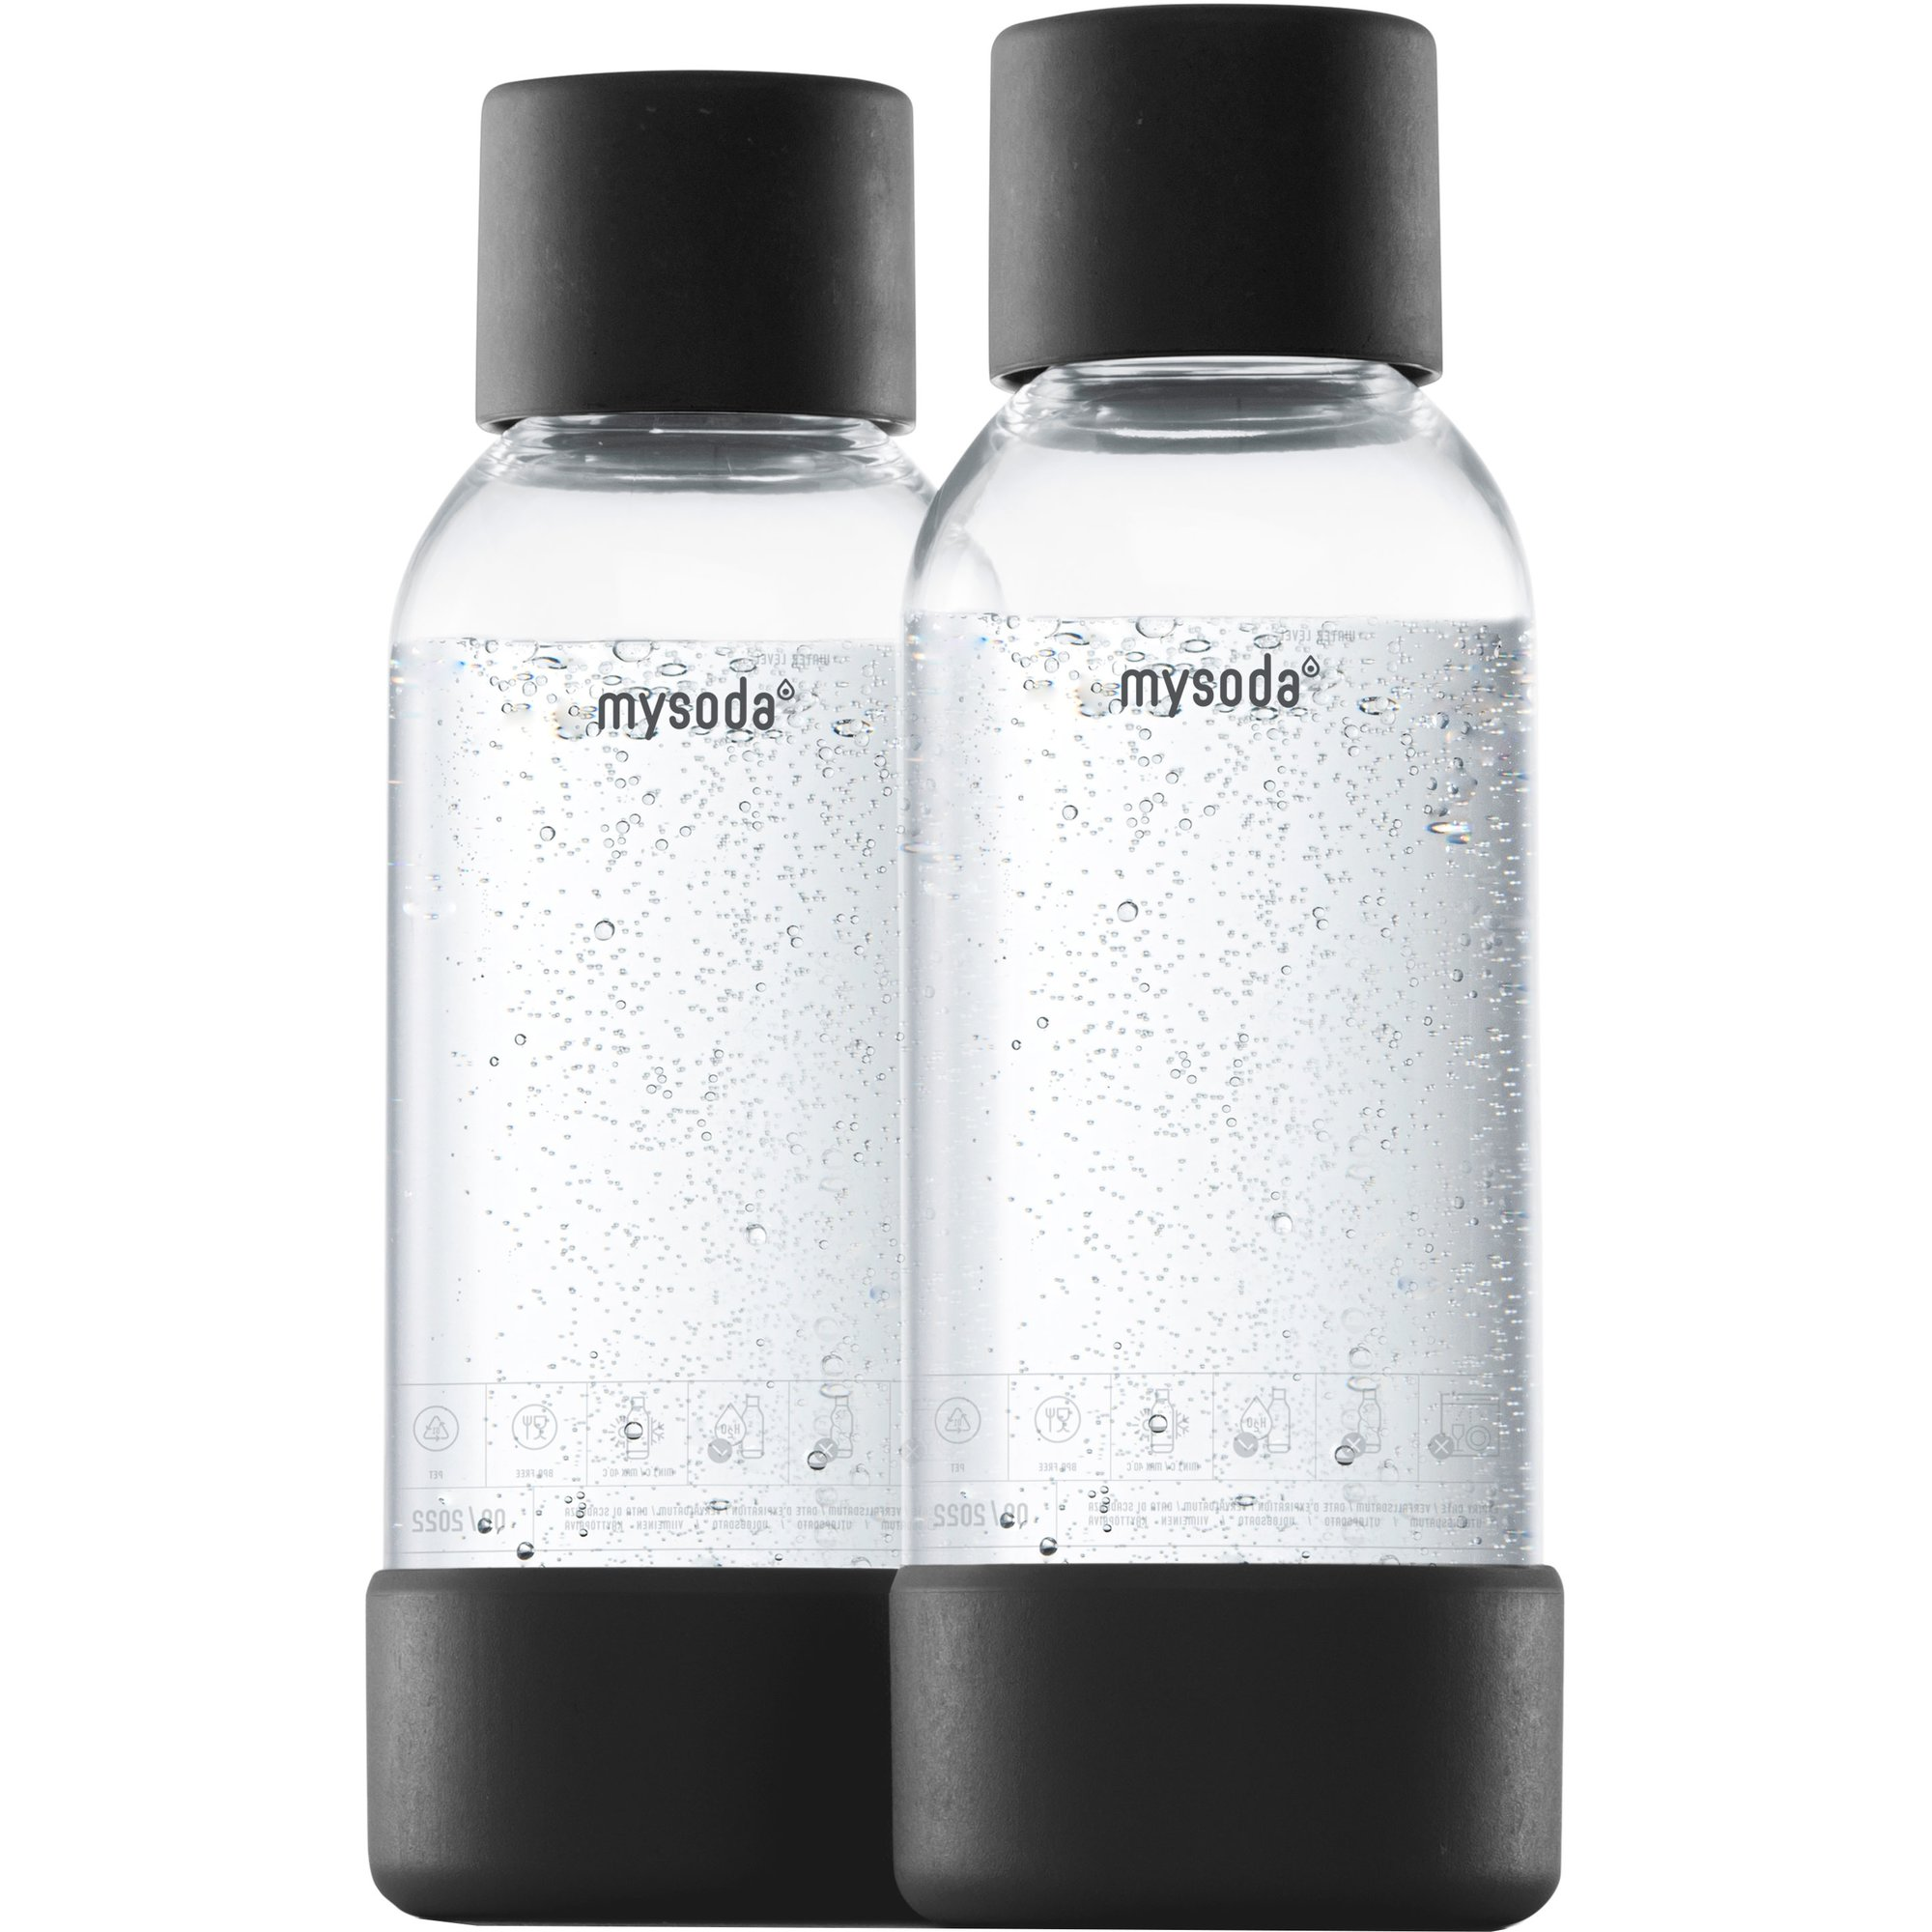 MySoda Vattenflaska 05 liter 2 st. Svart